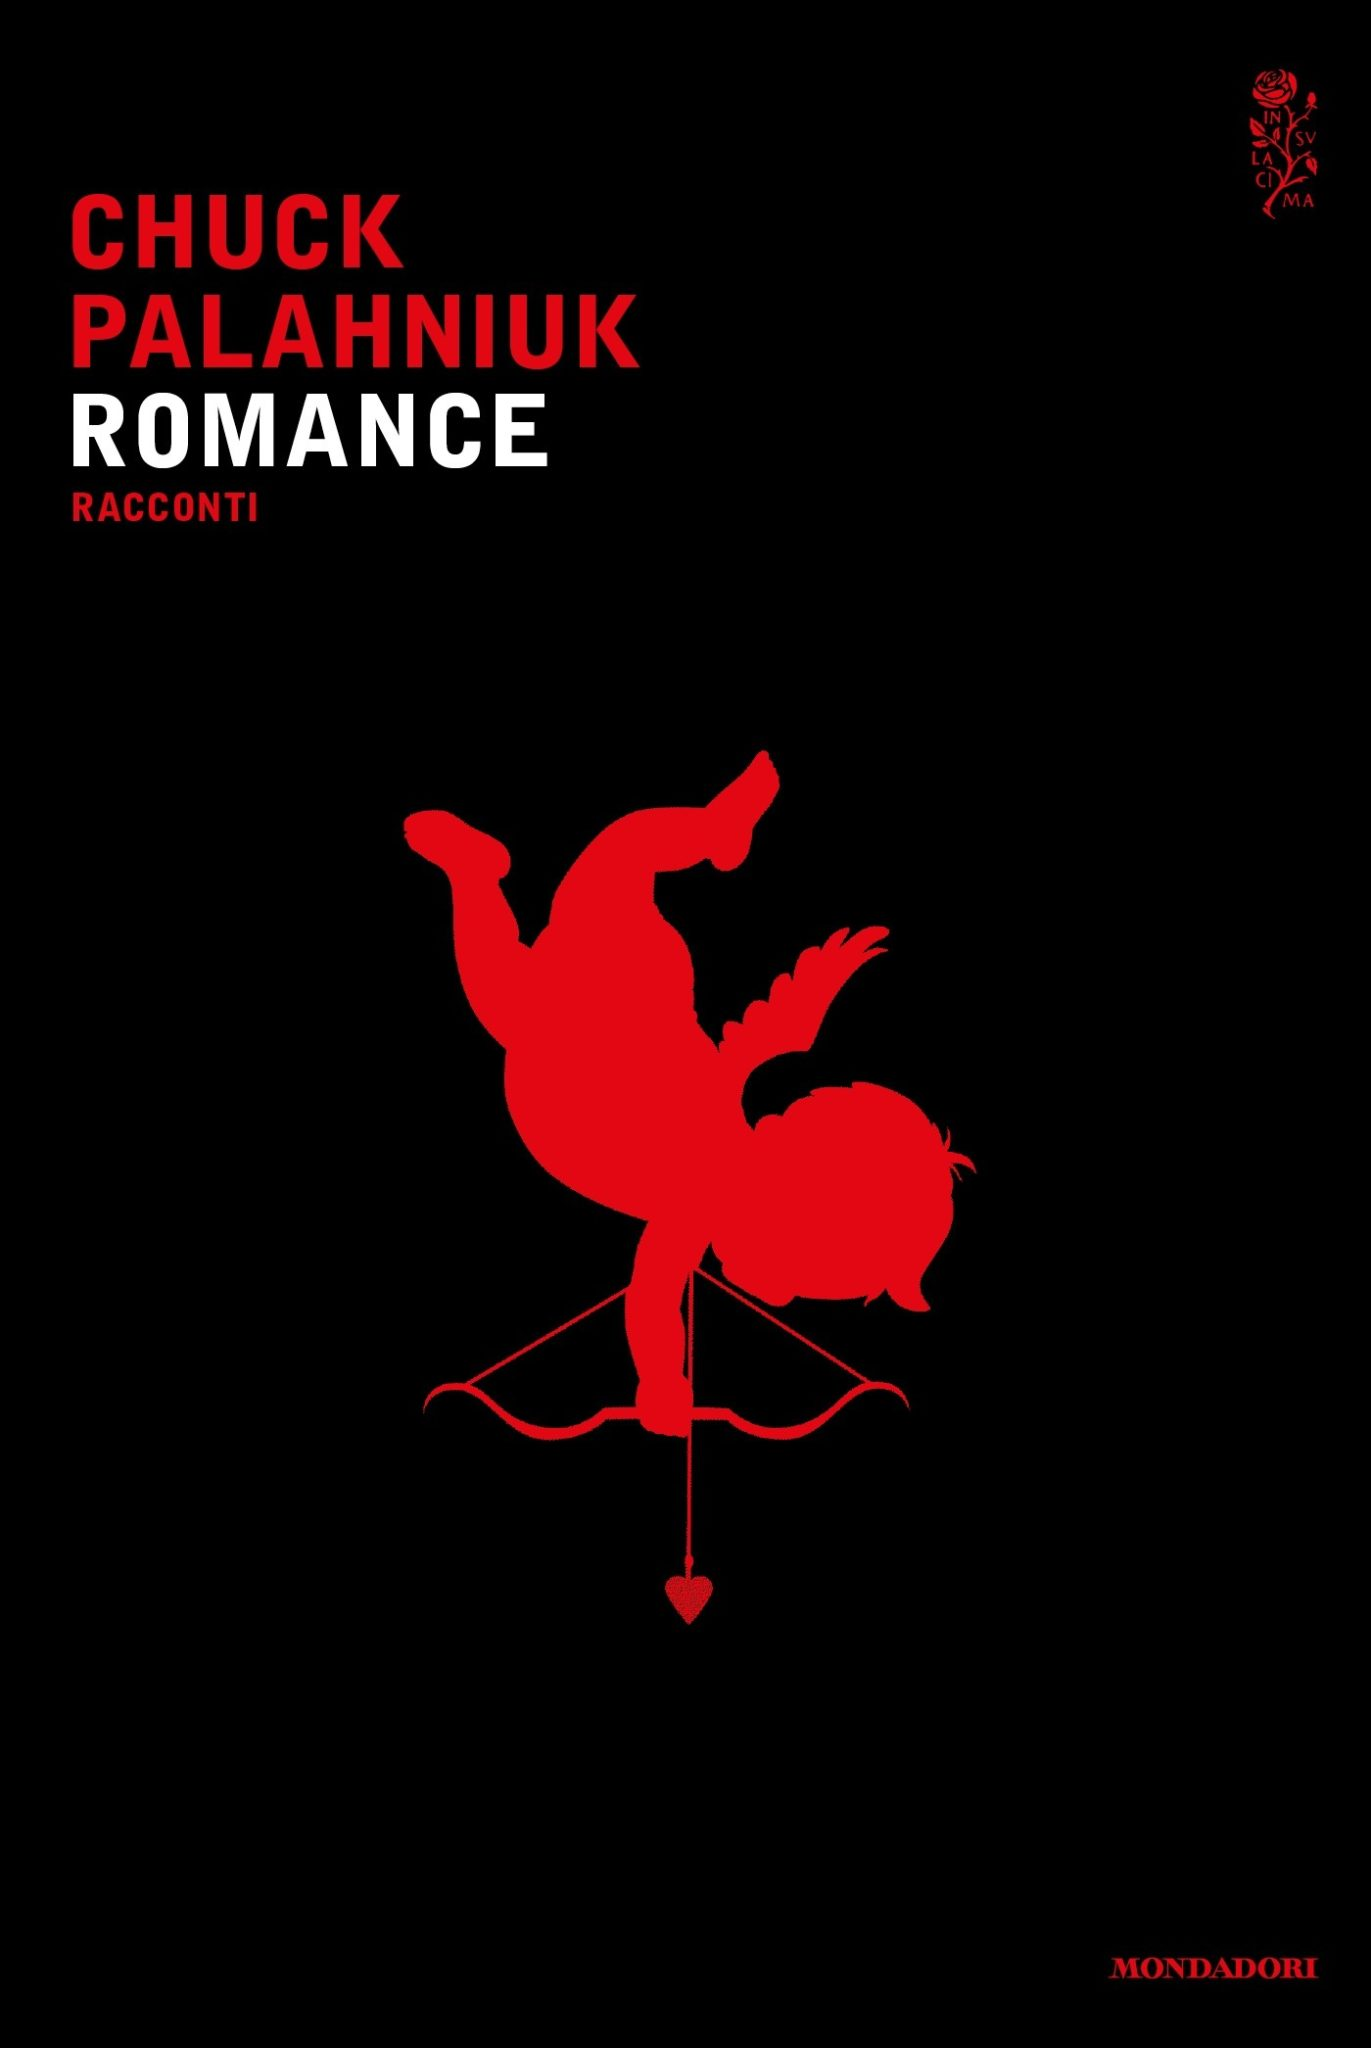 Recensione di Romance – Chuck Palahniuk